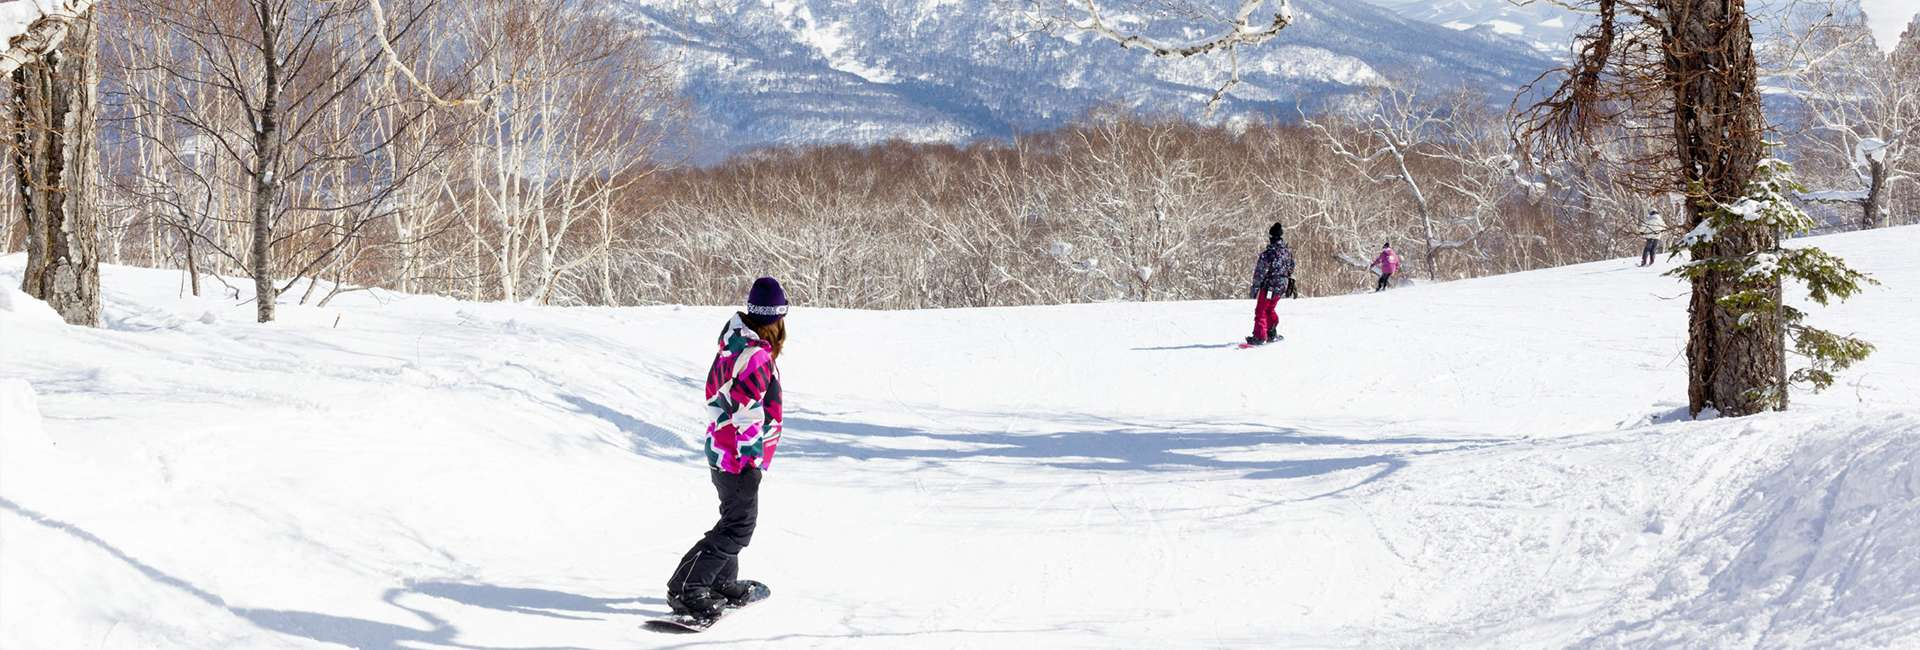 piste de ski à Niseko